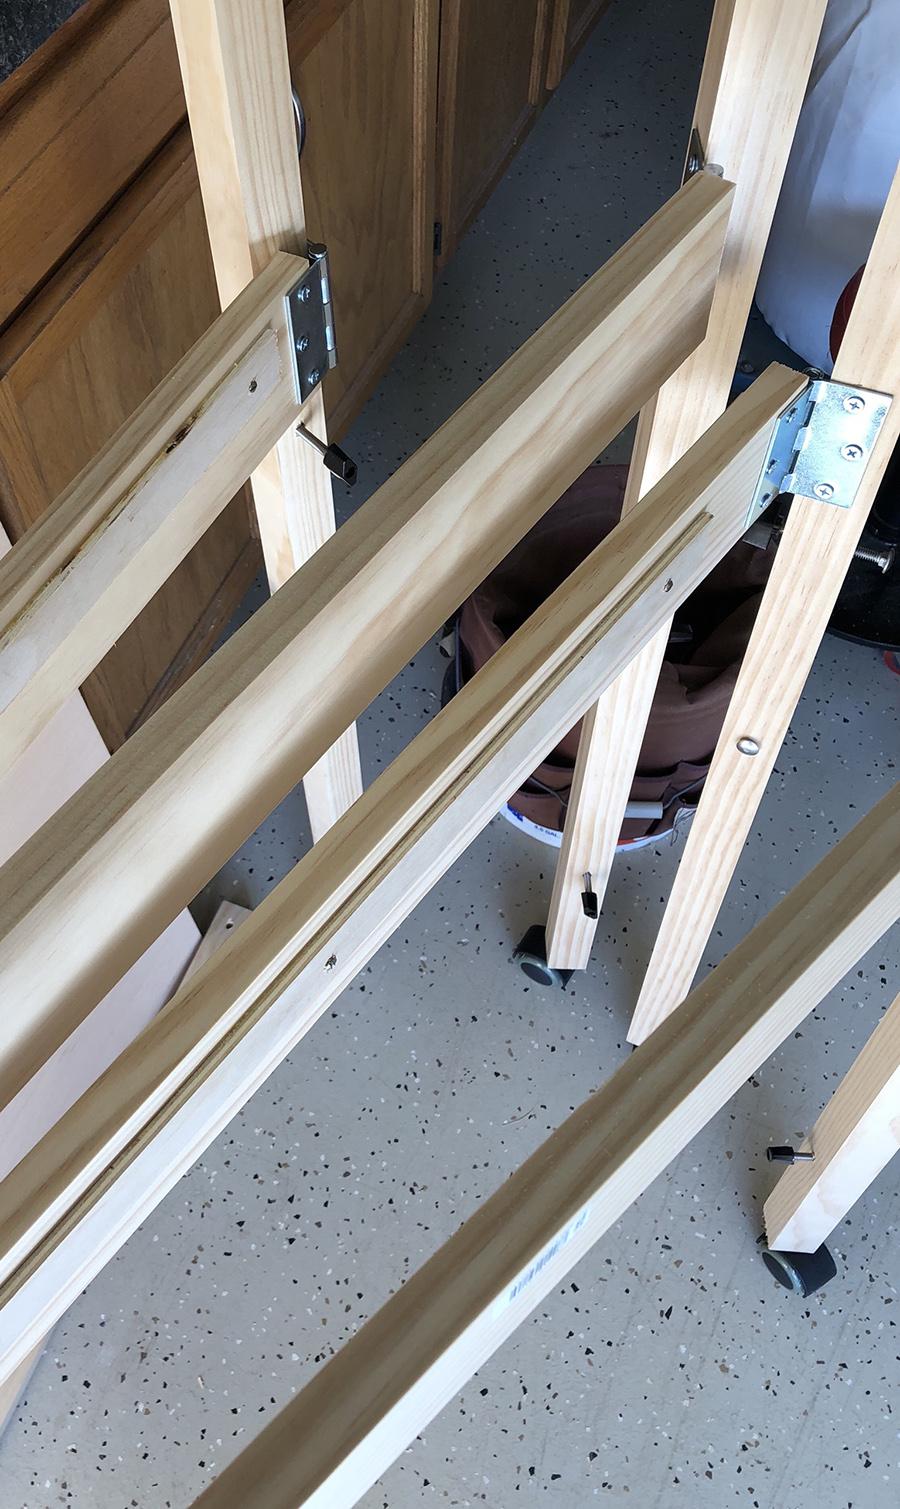 model train folding bench